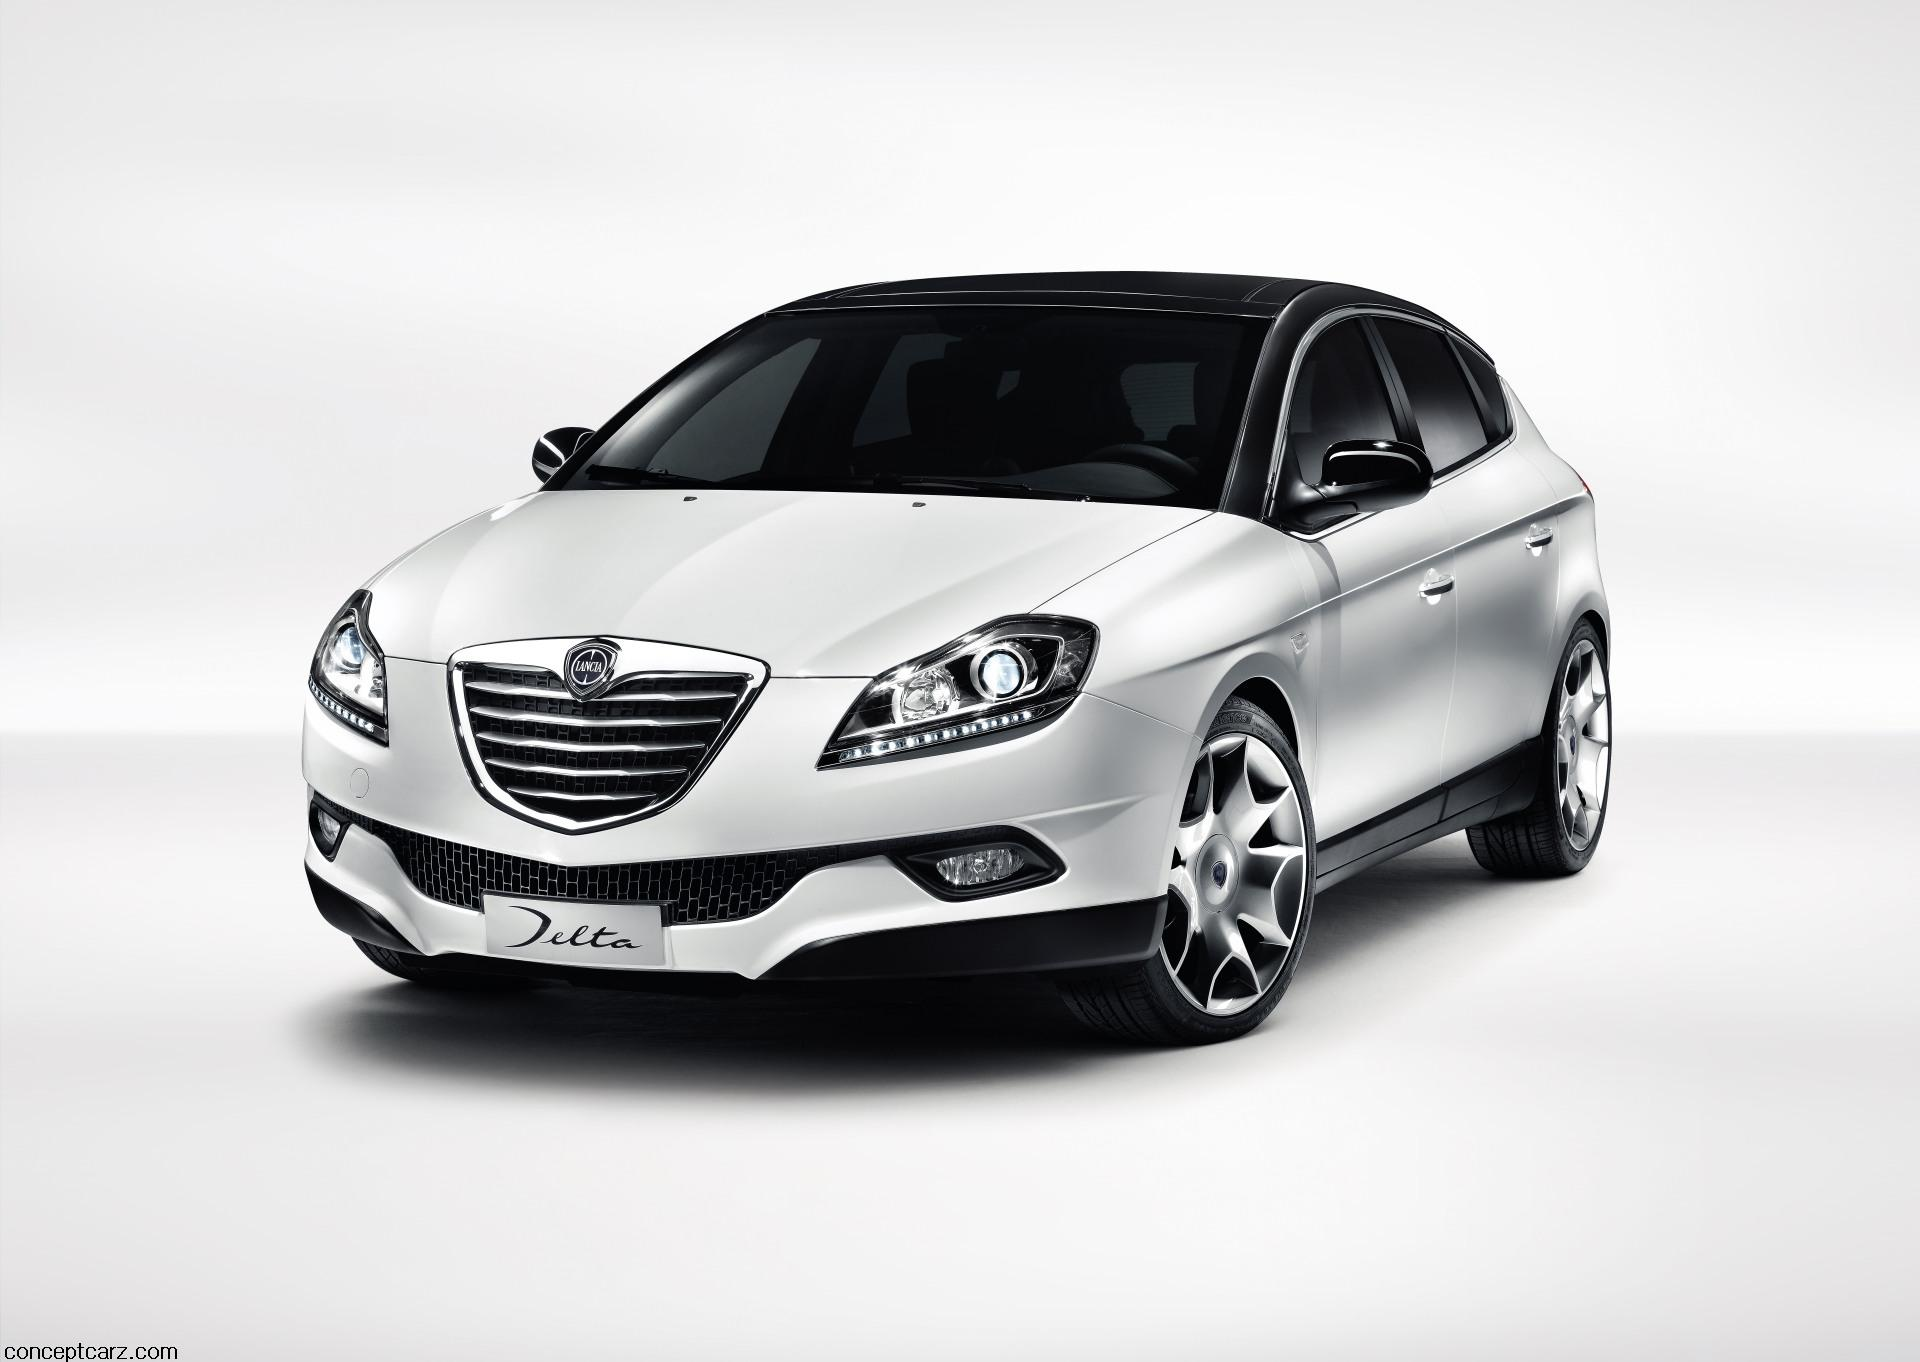 https://www.conceptcarz.com/images/Lancia/2012-Lancia-Delta-Crossover-Image-01.jpg